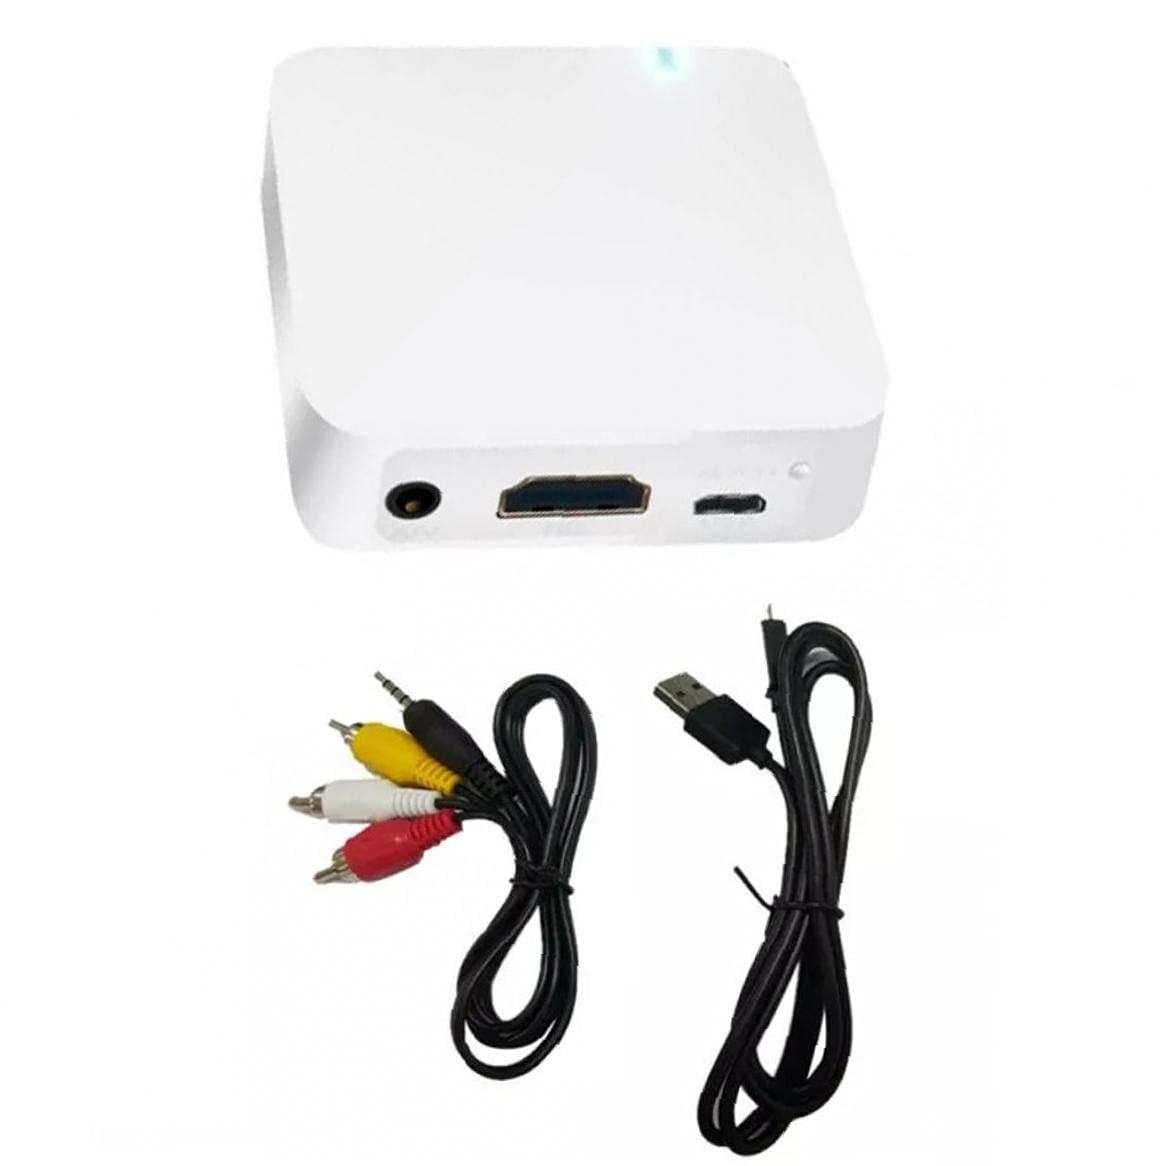 Car Wireless Display Dongle AV HD Screen Mirroring Box WiFi Streaming Stick Video Equipment